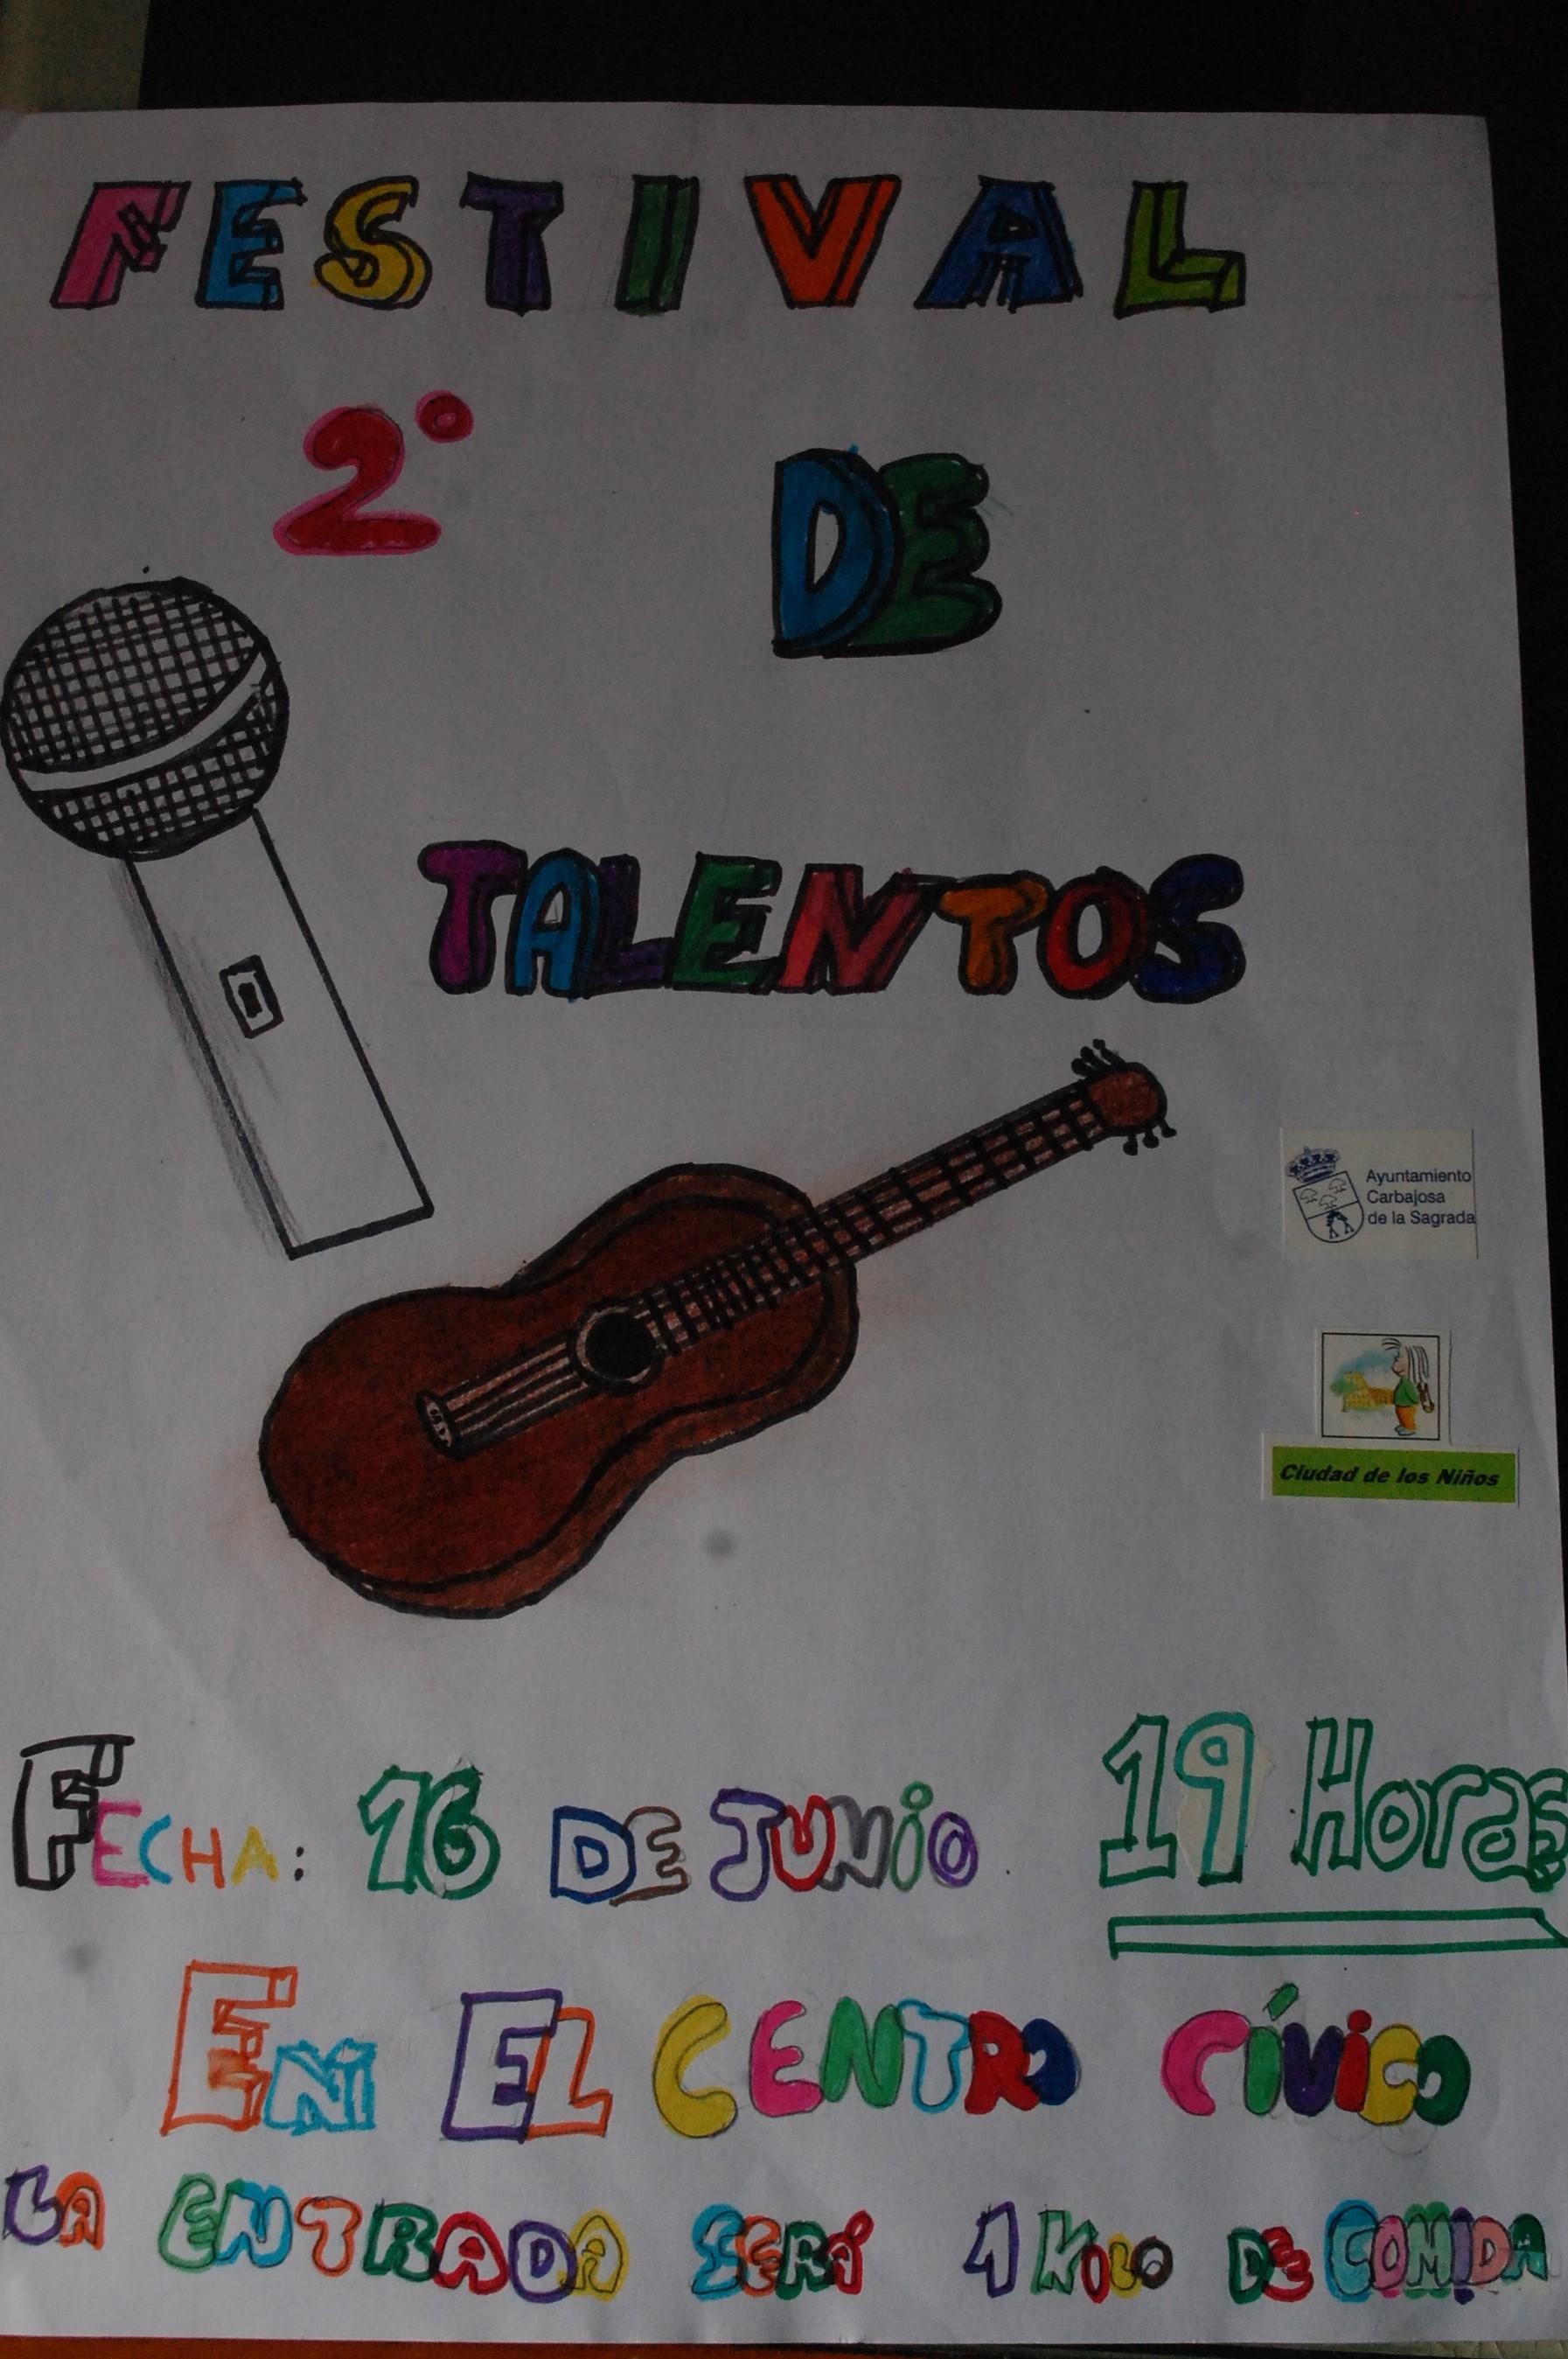 Festival de Talentos 2017